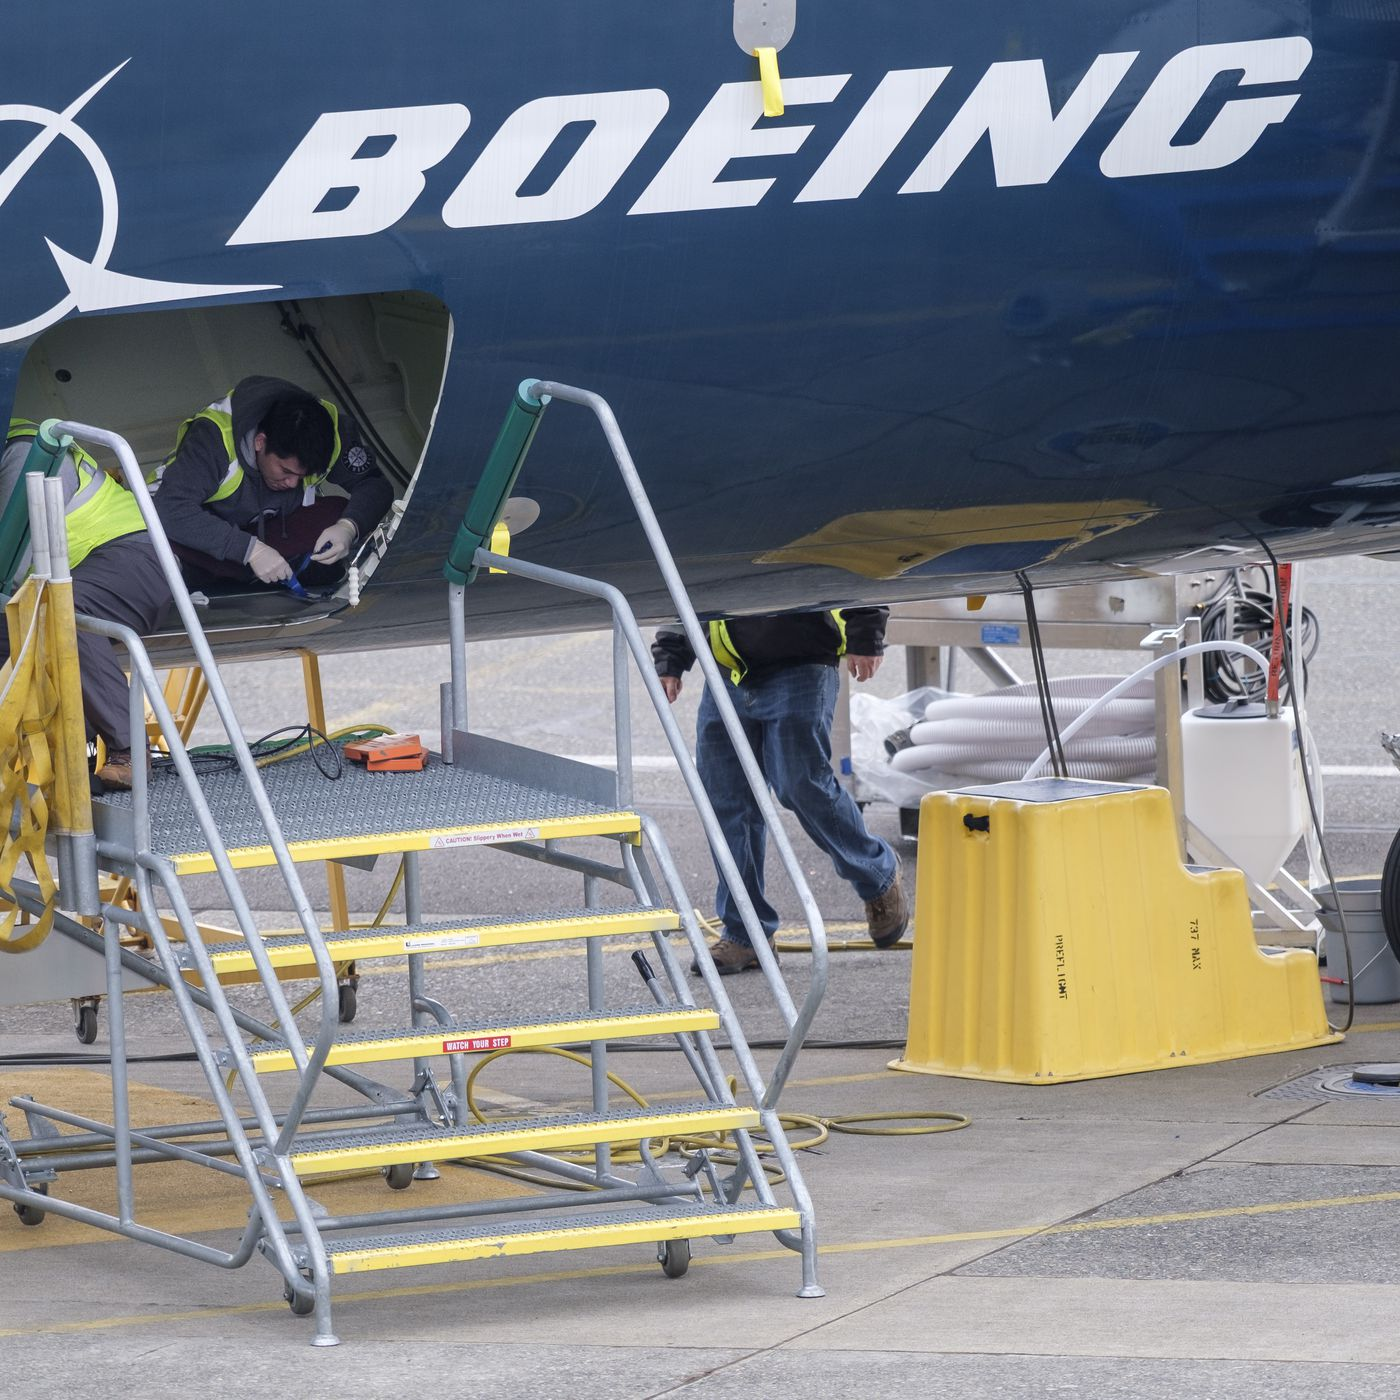 Boeing 737 Max 8 crash report: Ethiopia says pilots followed